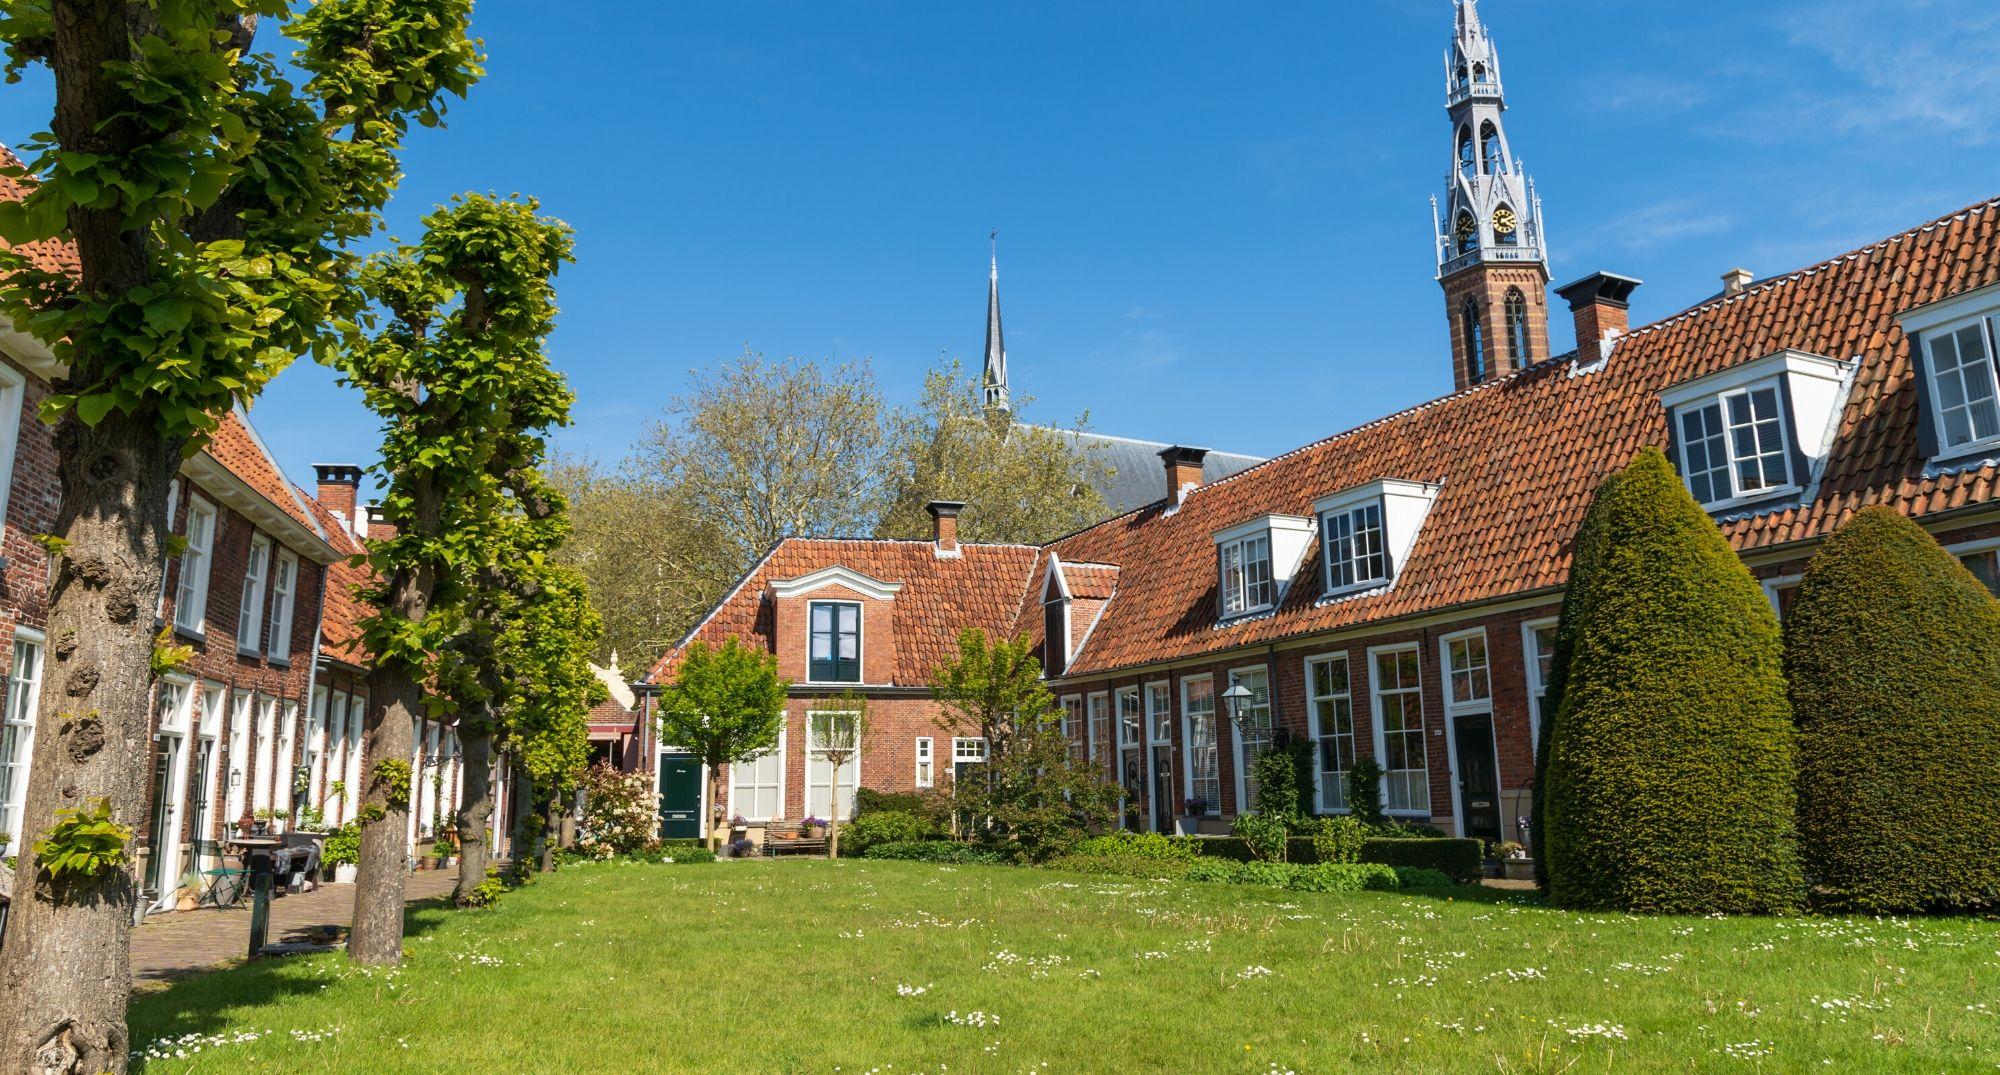 Groningen hidden courtyards | Your Dutch Guide